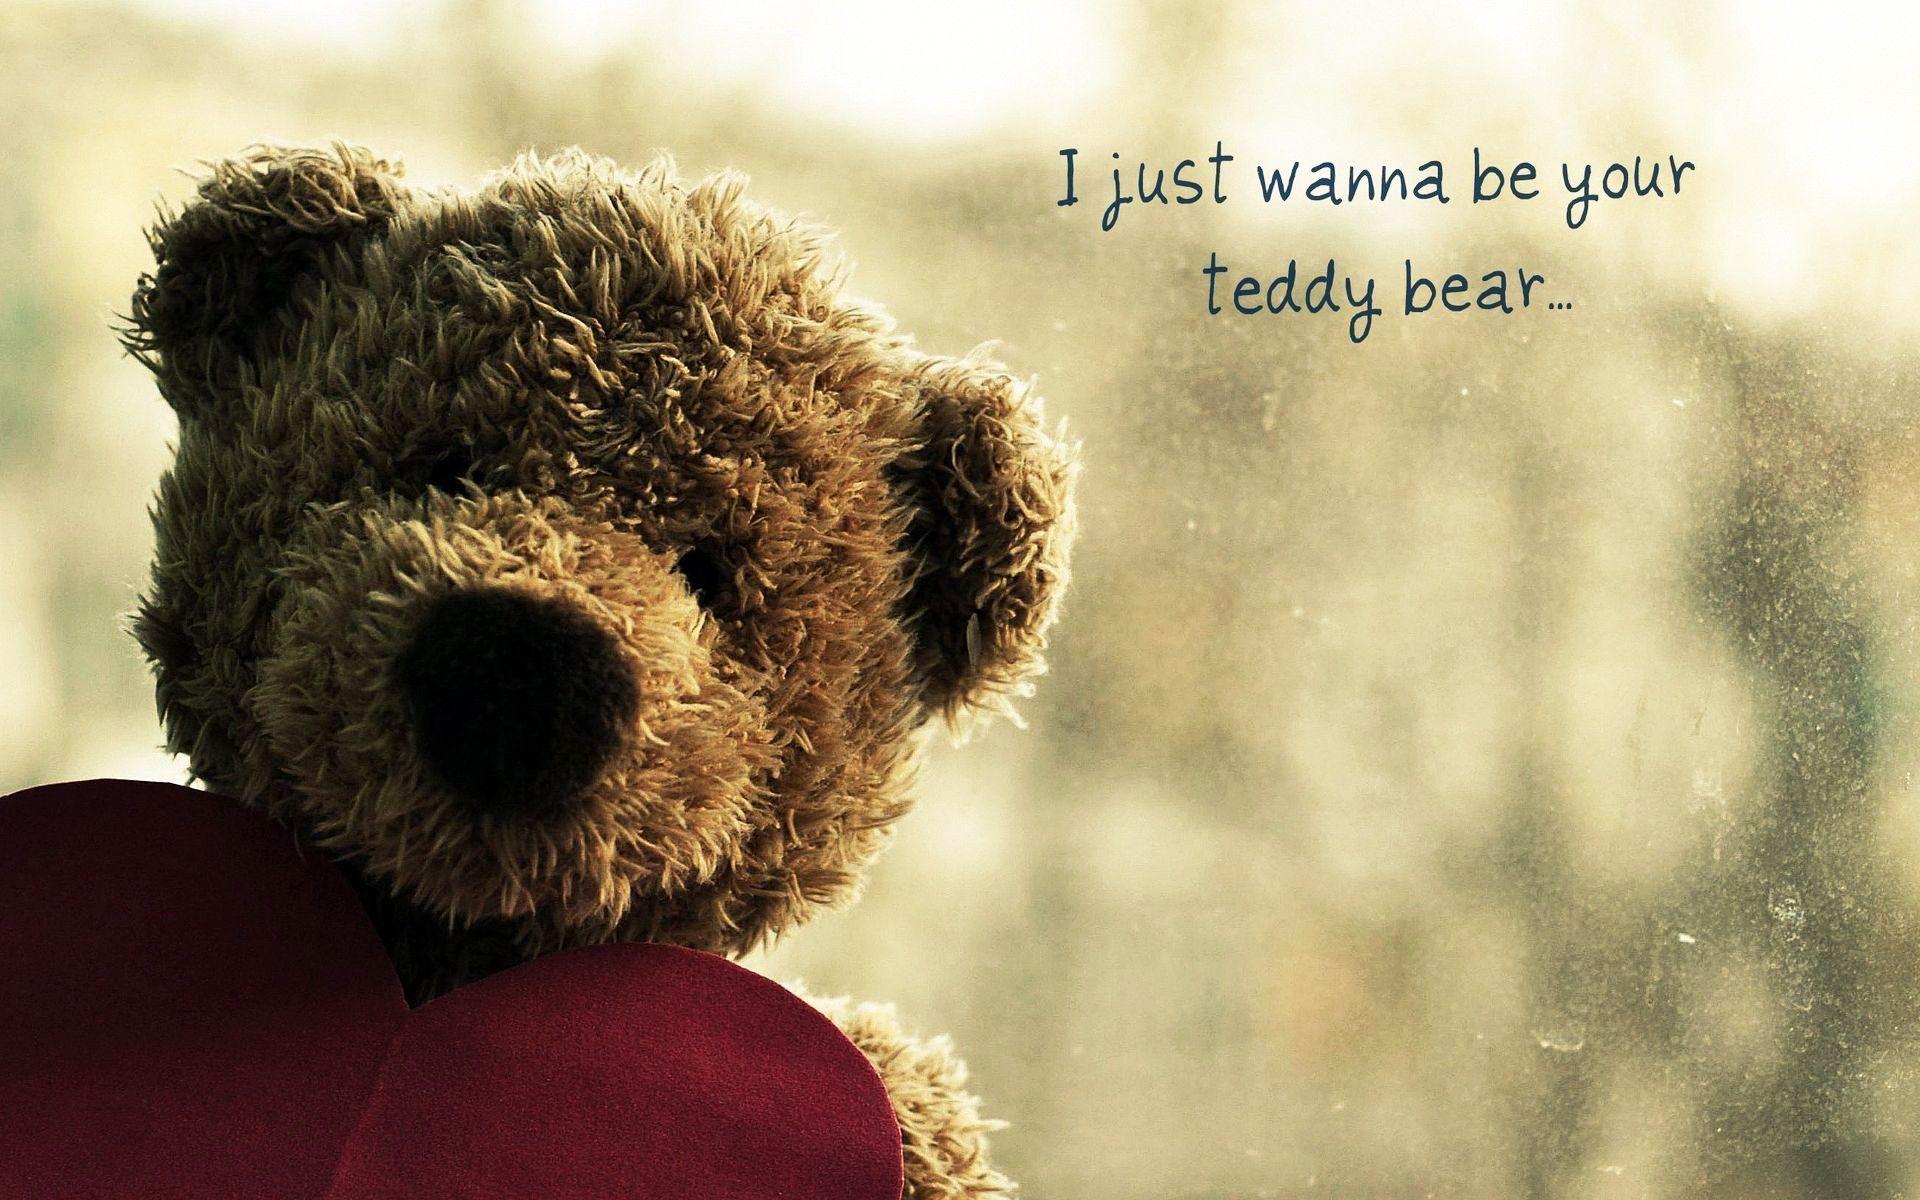 Wallpaper download funny - Teddy Bear Cute Funny Wallpaper Download